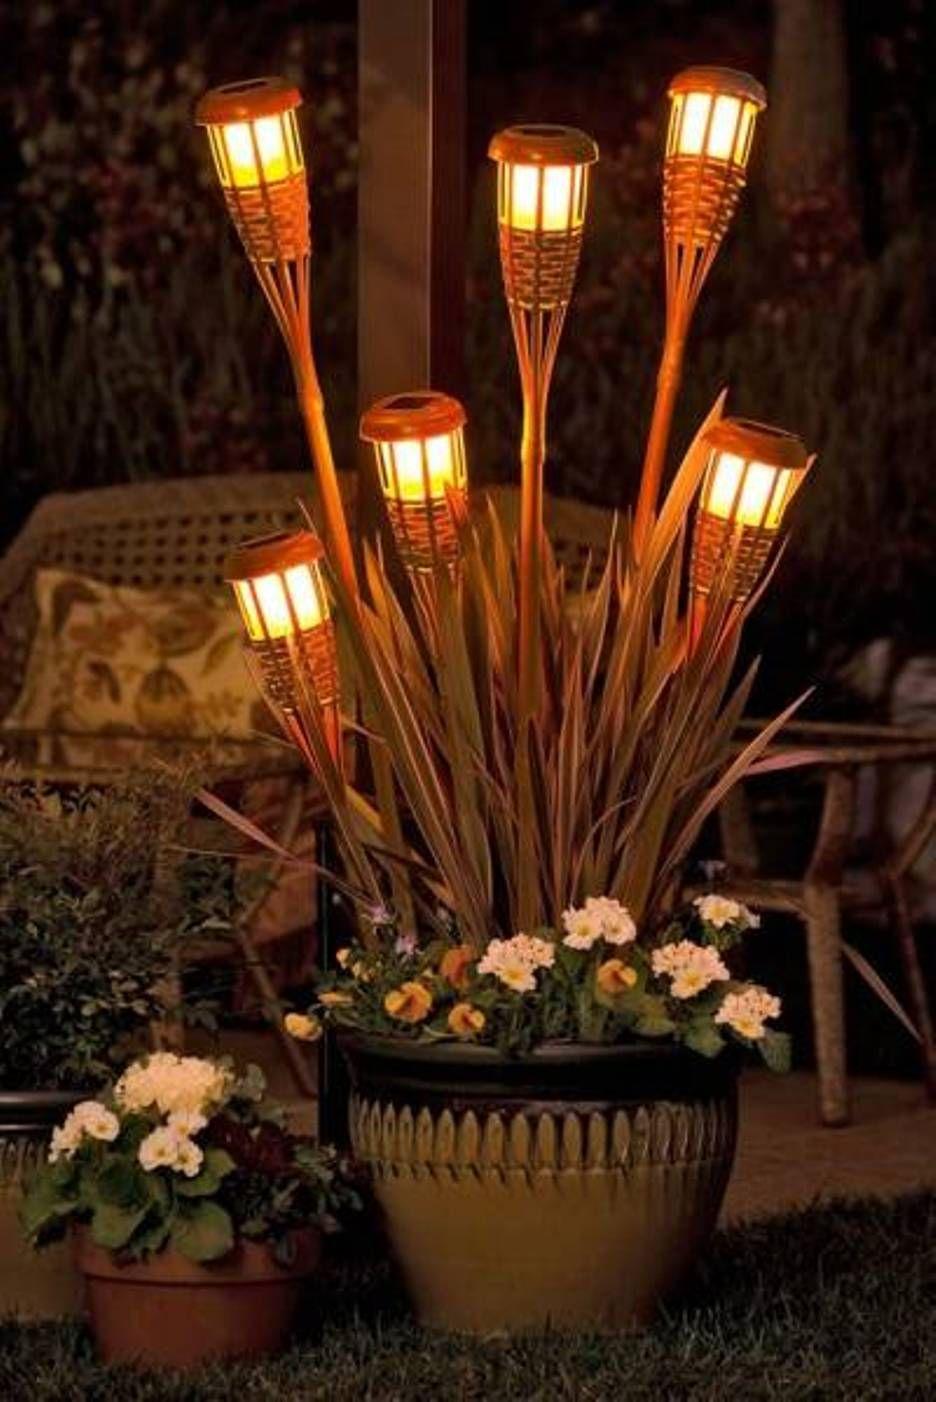 outdoor patio lighting ideas diy. Torches Outdoor Patio Lights : Stunning Decorative Gallery | DesignArtHouse.com - Lighting Ideas Diy